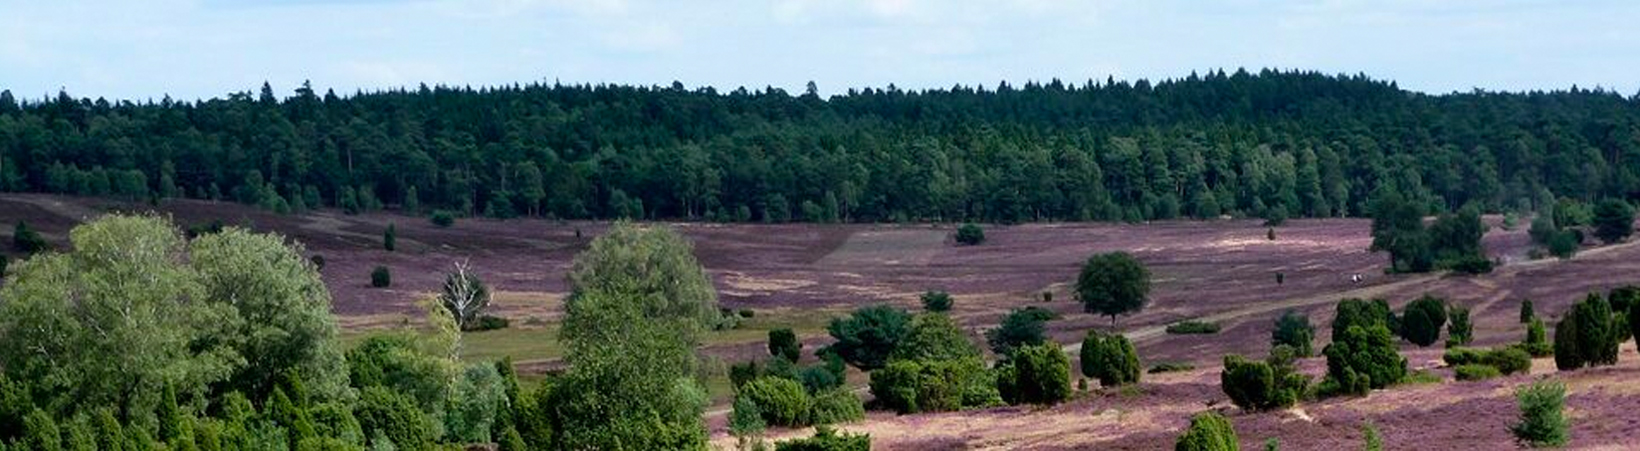 Naturcamping Lüneburger Heide - Region im Überblick